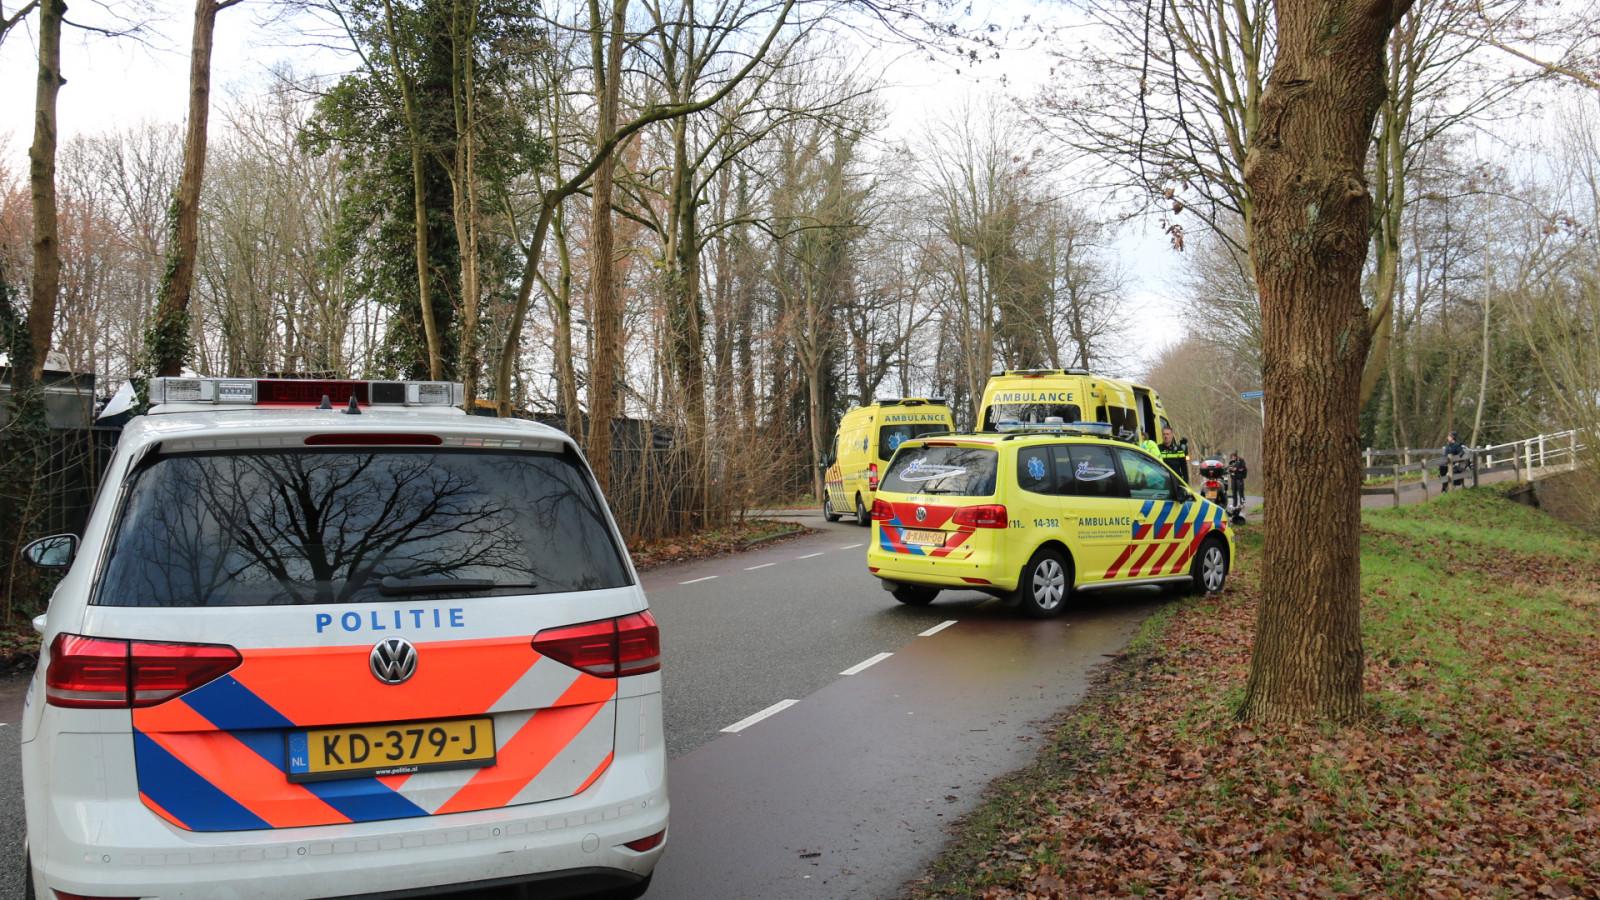 Fietser zwaargewond na botsing met scooter in Hilversum.